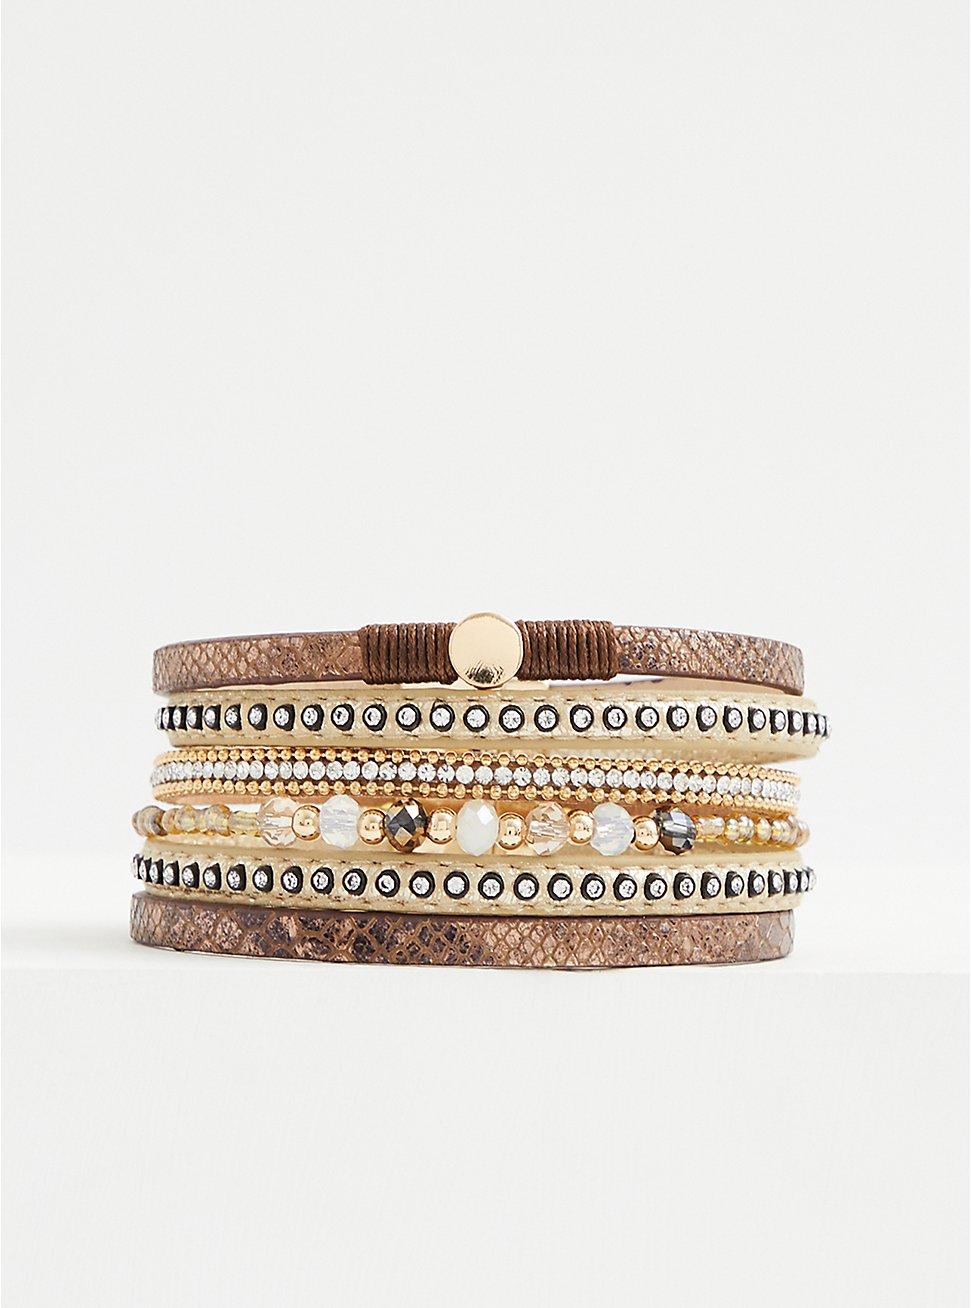 Brown Snakeskin Print & Gold-Tone Beaded Magnetic Bracelet, MULTI, hi-res